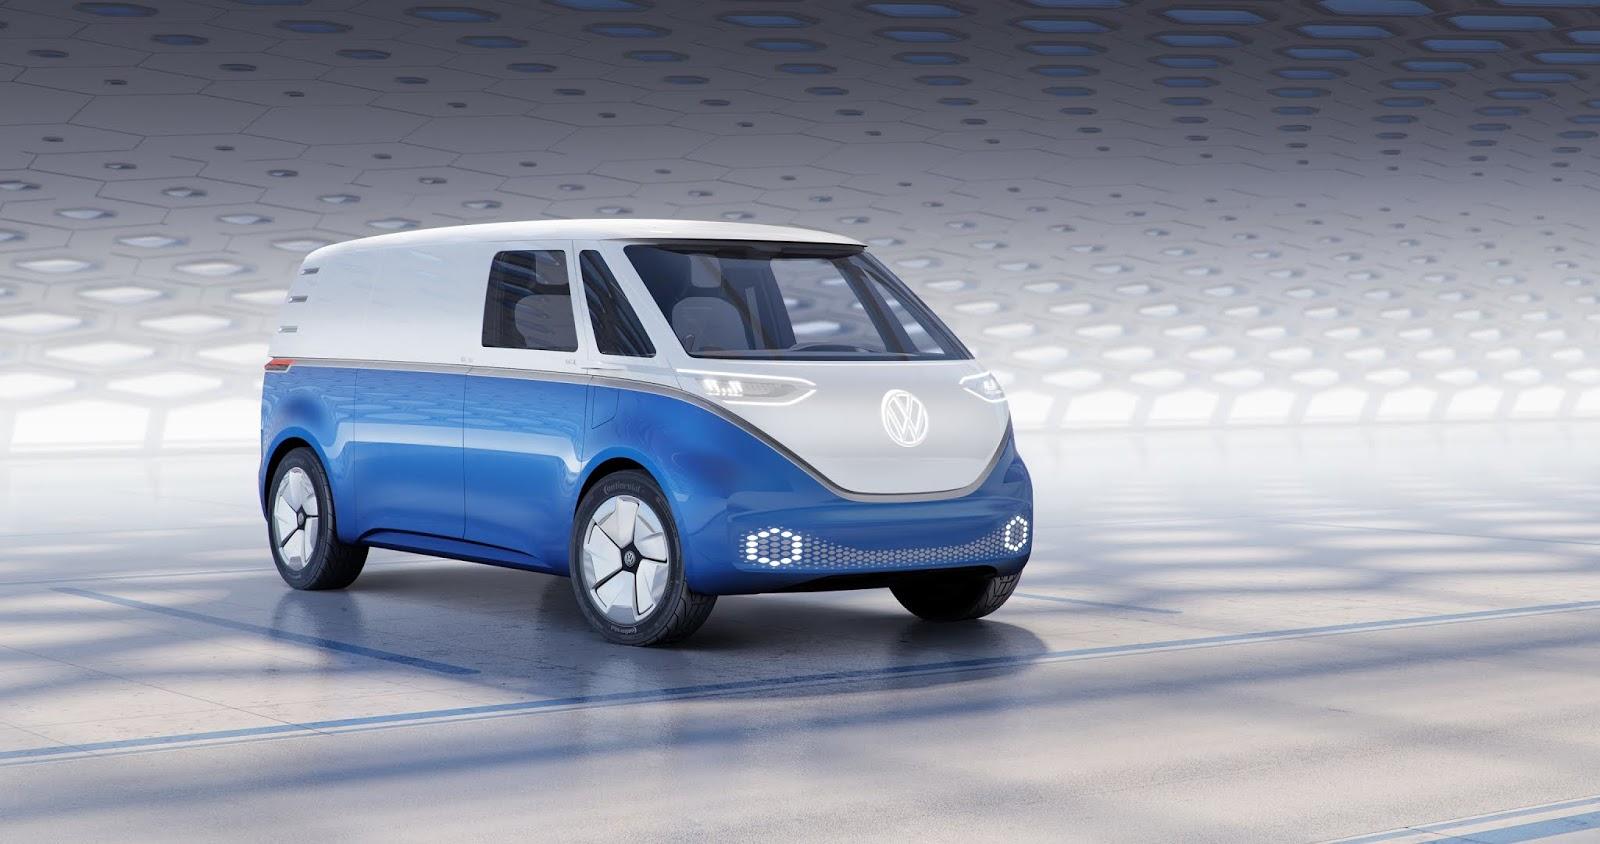 VOLKSWAGEN2BI.D.2BBUZZ2BCARGO2B1 Αυτό είναι το νέο, ηλεκτρικό βαν της Volkswagen Electric cars, Volkswagen, VW Transporter, Επαγγελματικά